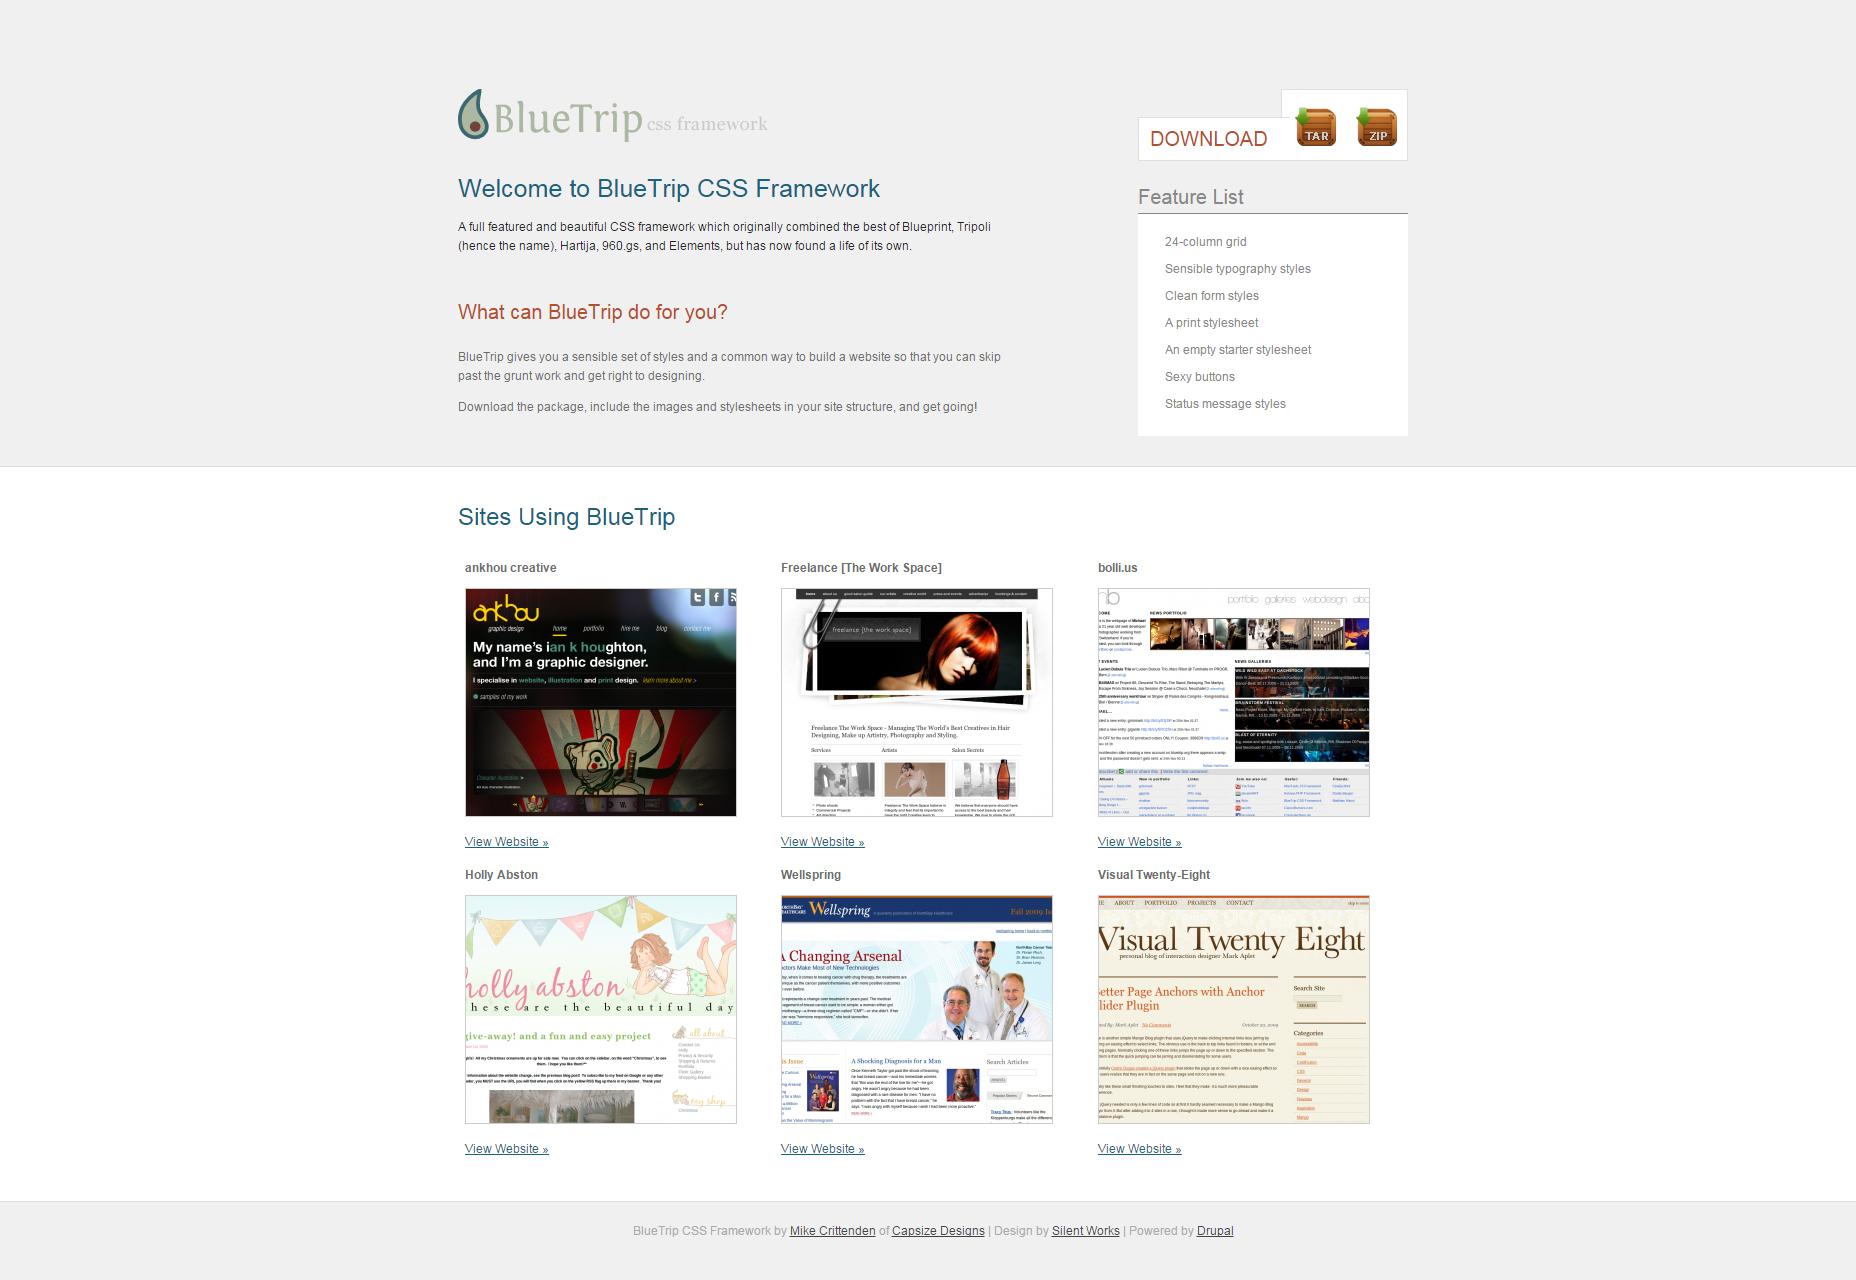 BlueTrip: A Beautiful and Full-featured CSS Framework